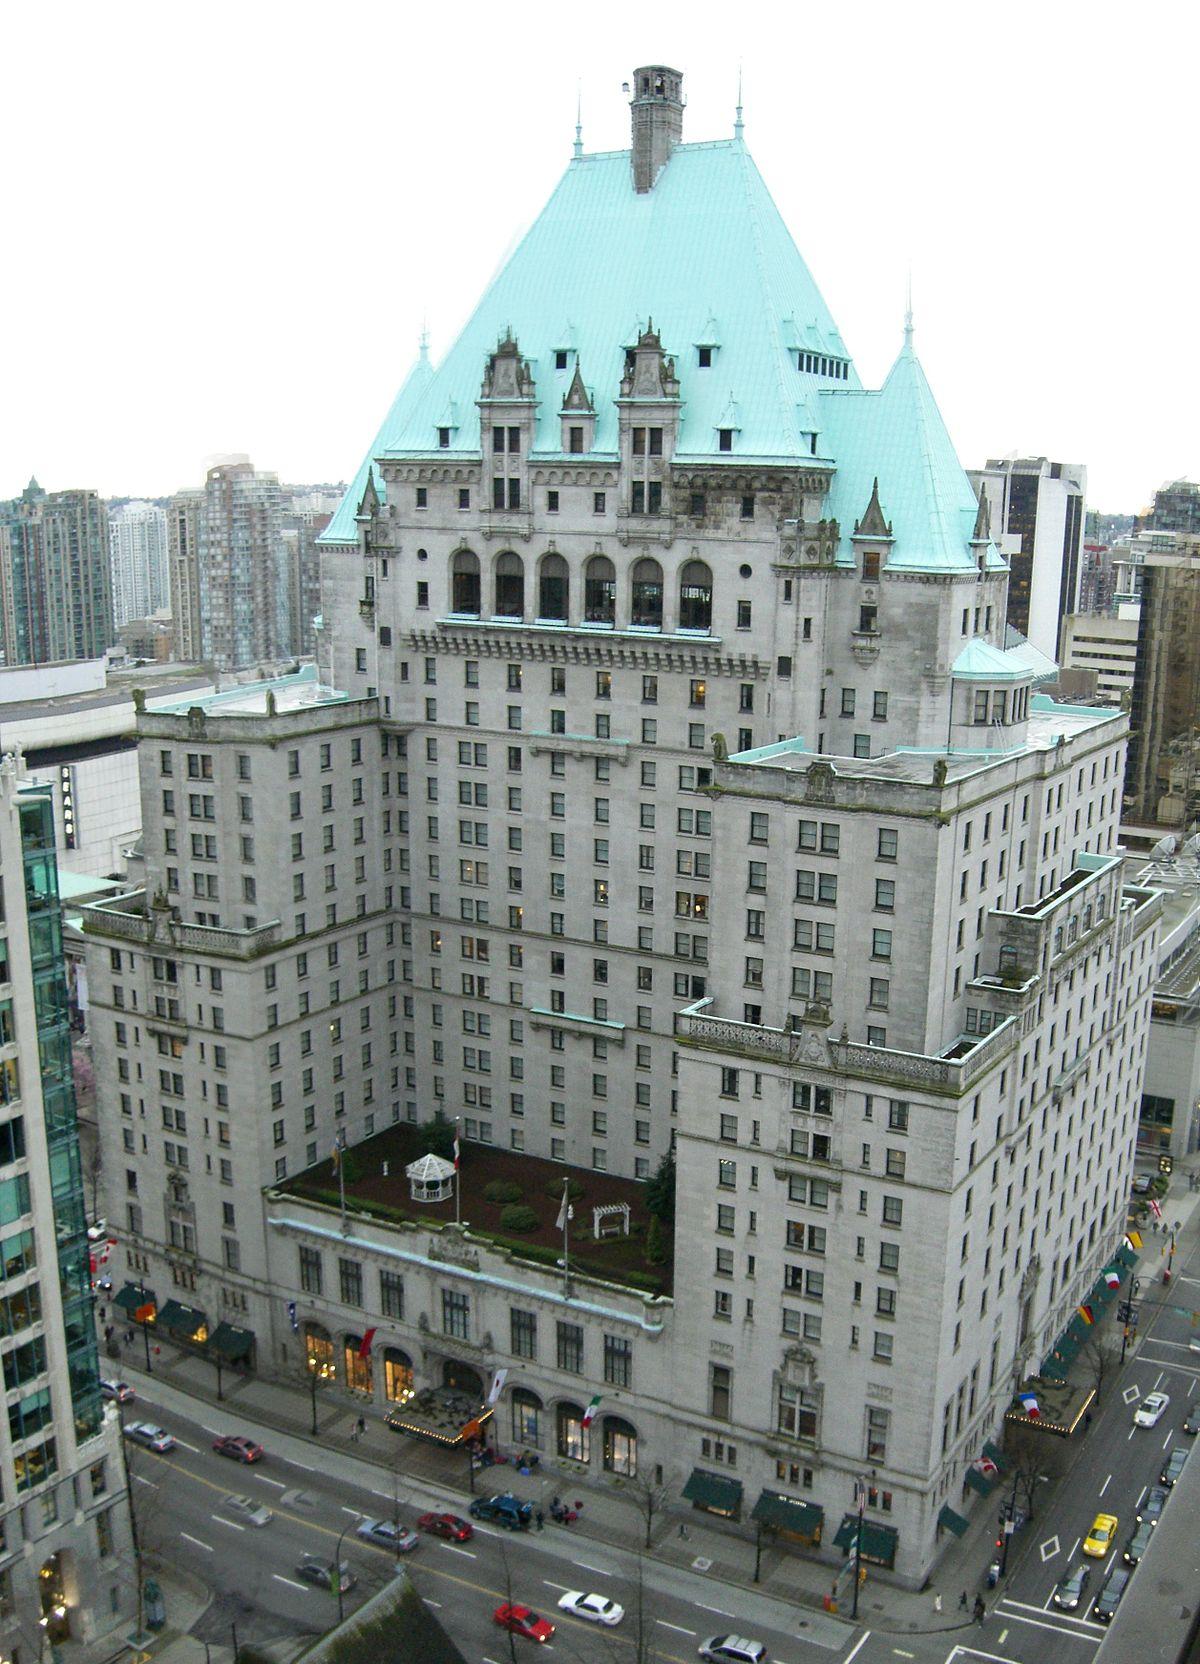 Hotel vanc 2007.jpg